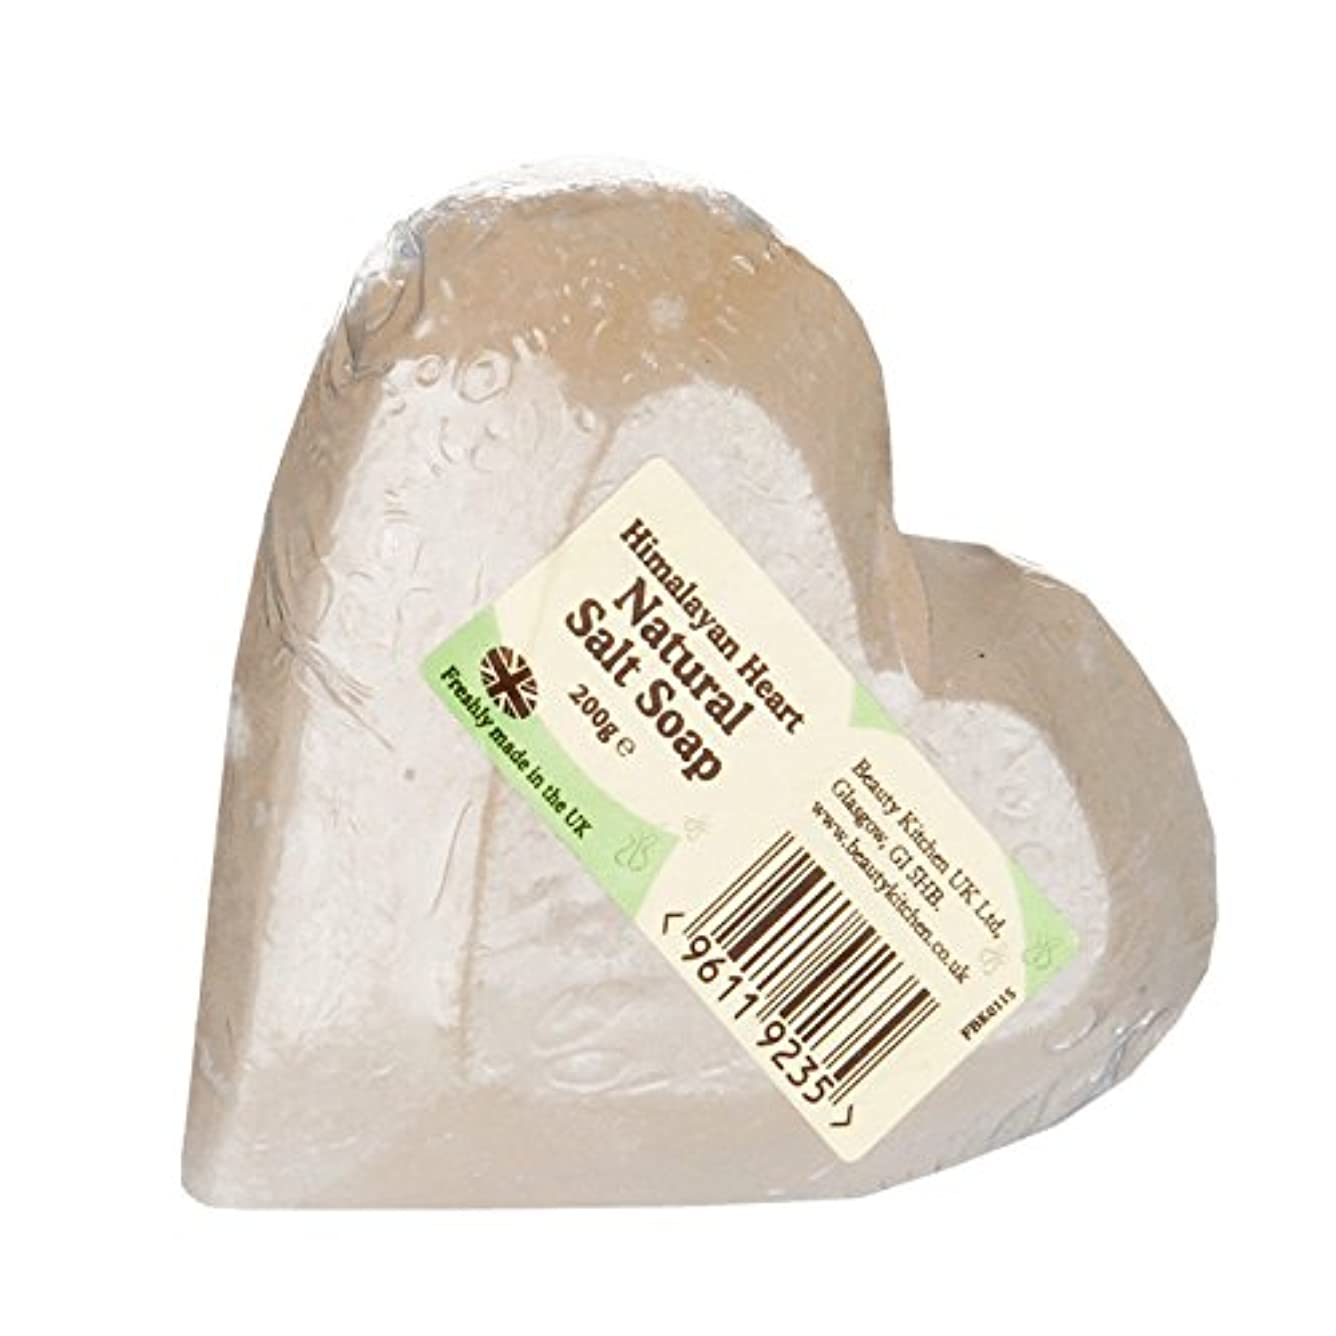 Beauty Kitchen Himalayan Heart Soap 200g (Pack of 2) - 美容キッチンヒマラヤンハートソープ200グラム (x2) [並行輸入品]